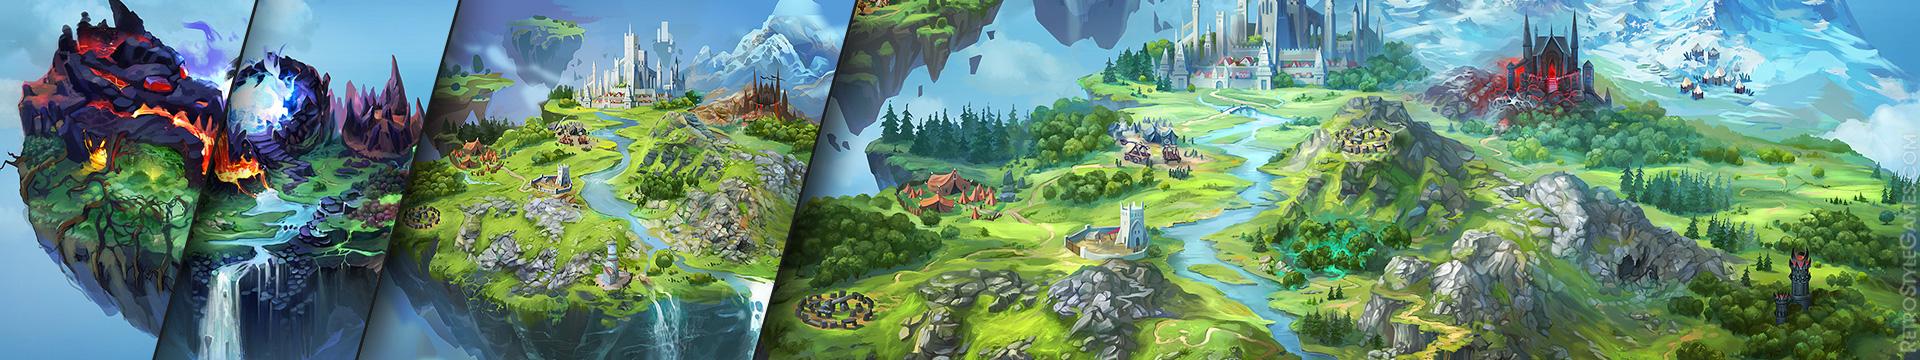 Making of Game Background Level Design Island